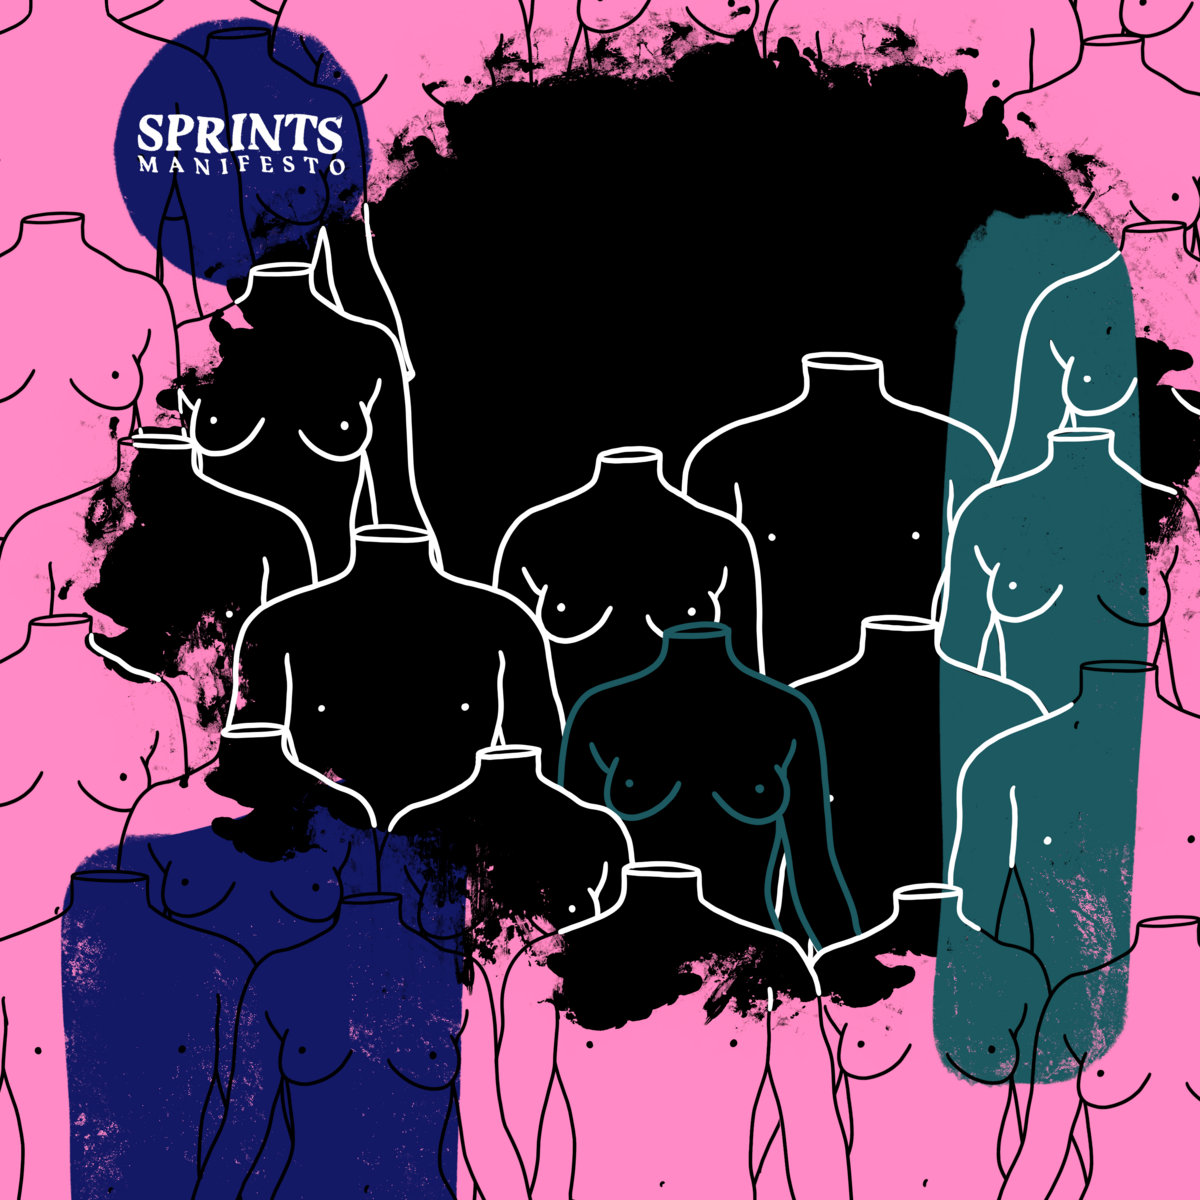 SPRINTS - Manifesto EP